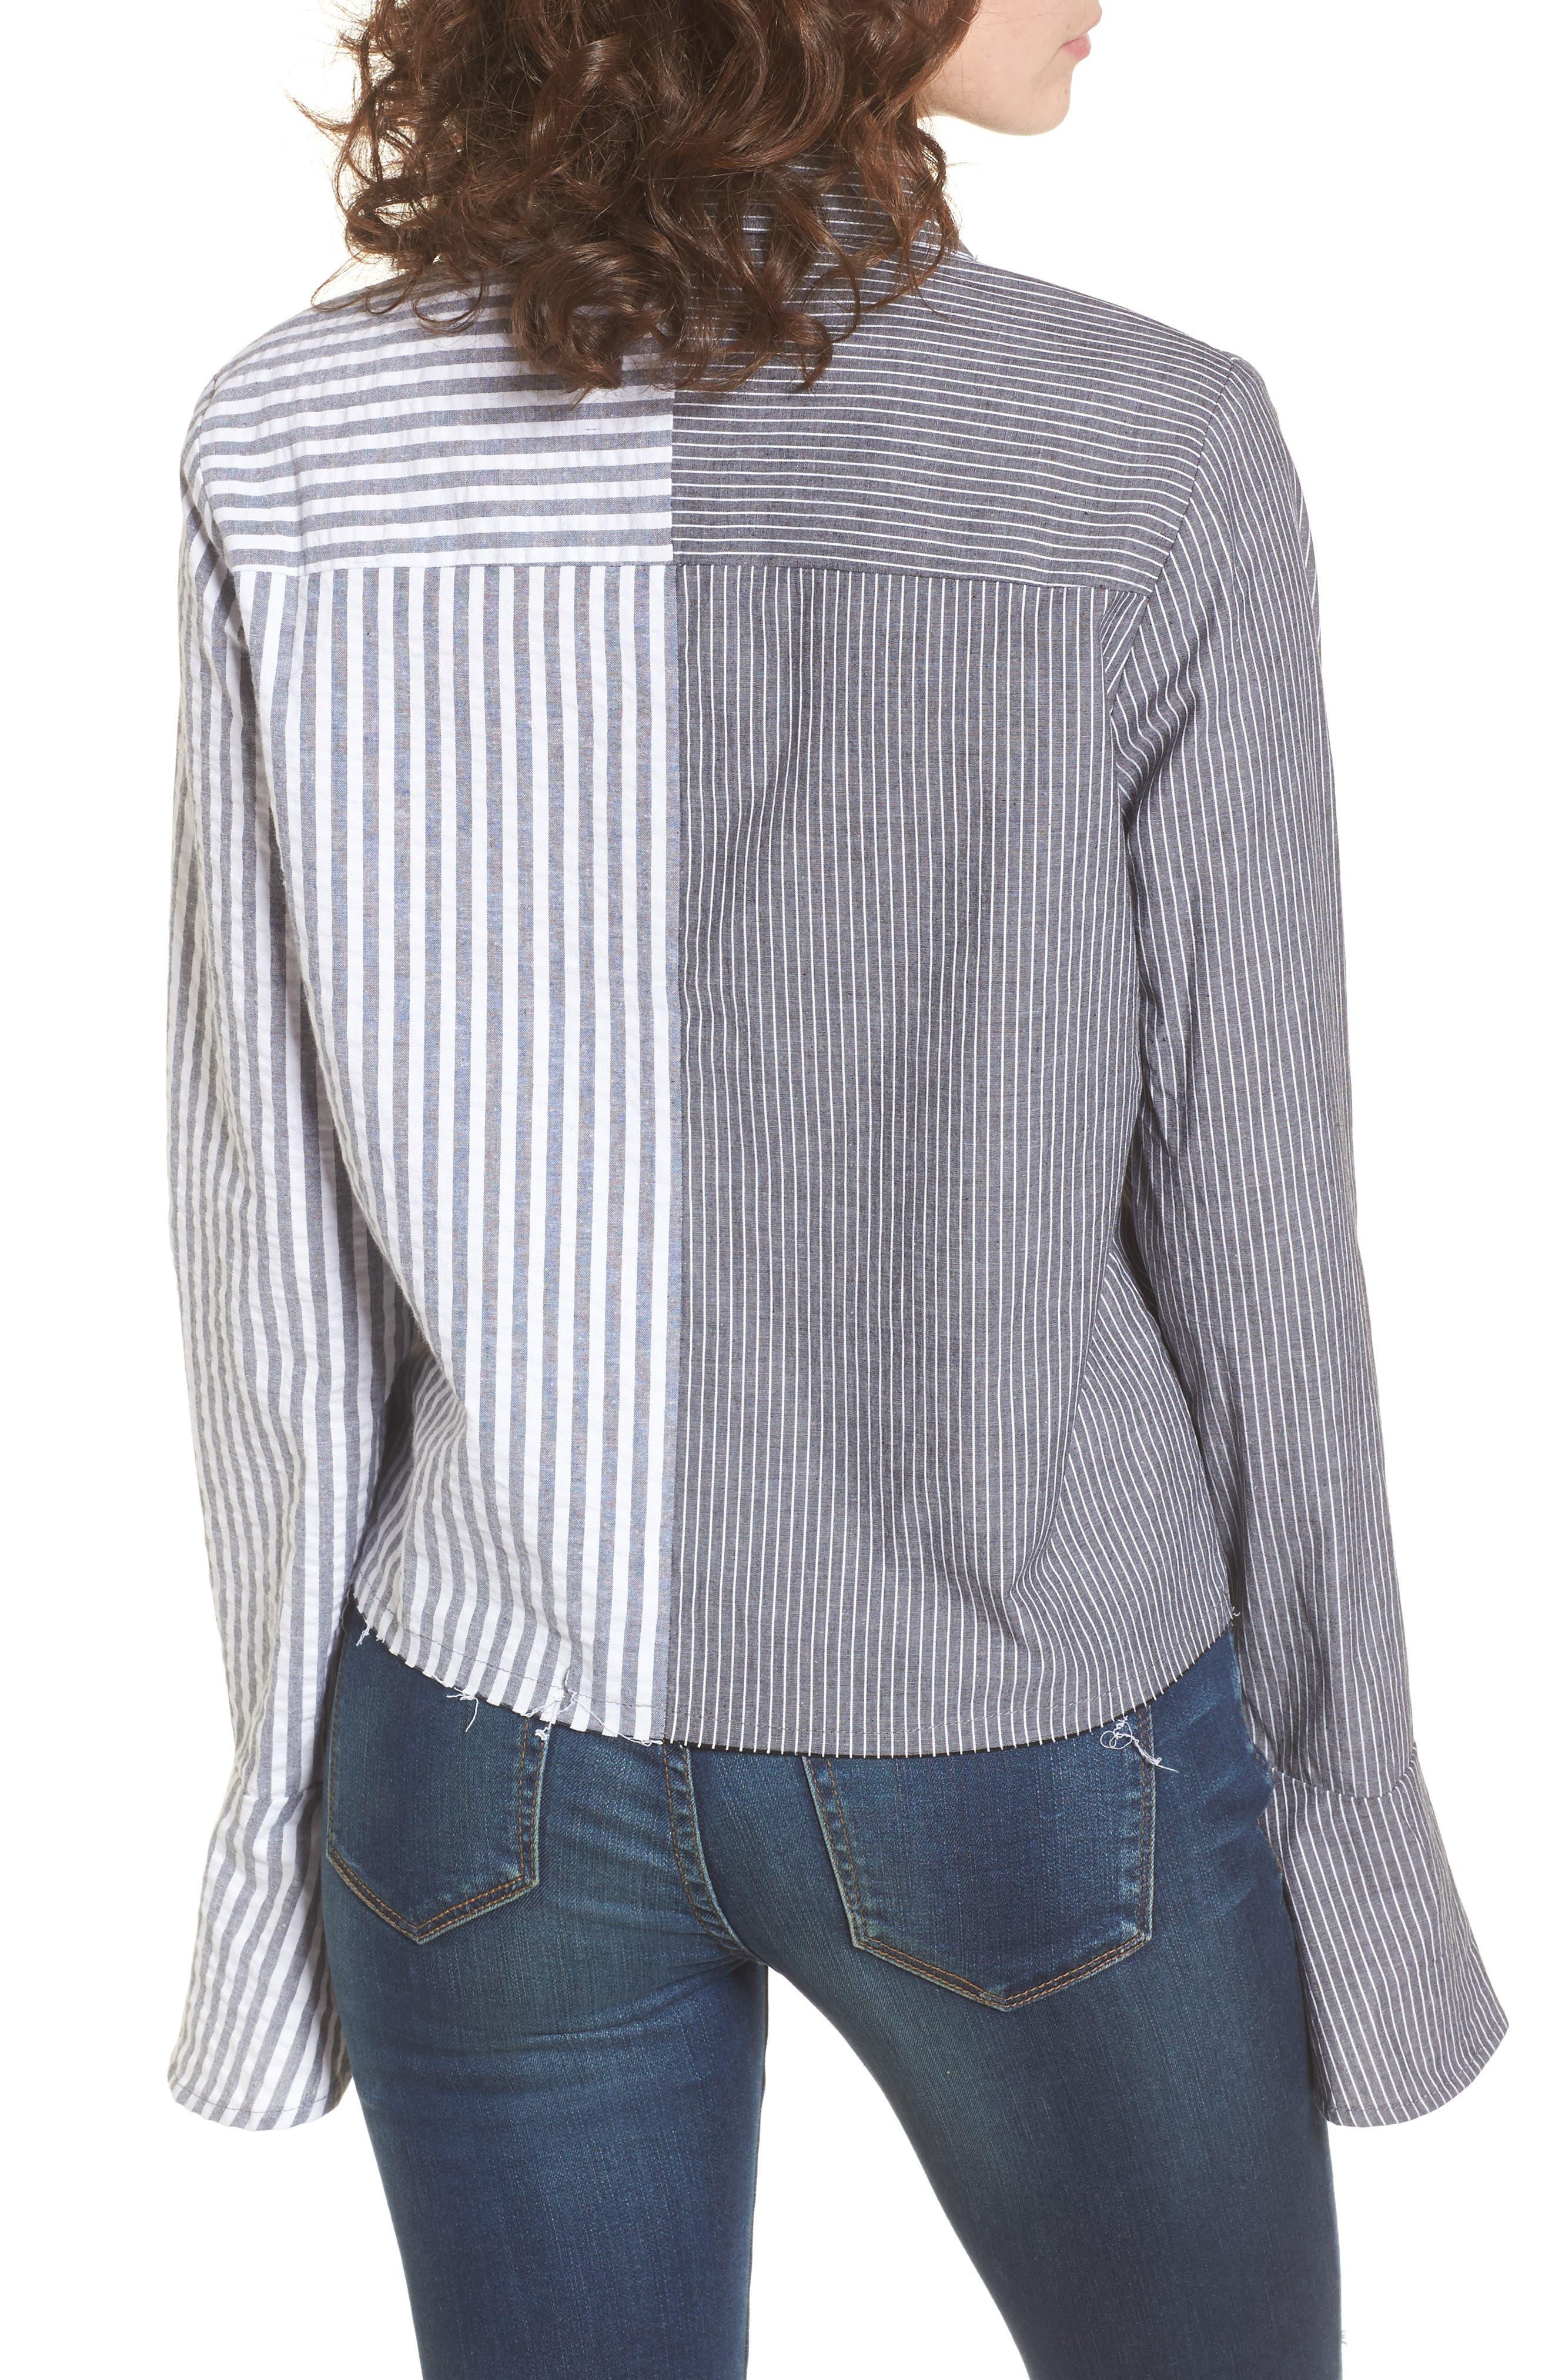 Mismatch Stripe Shirt,                             Alternate thumbnail 2, color,                             Stripe